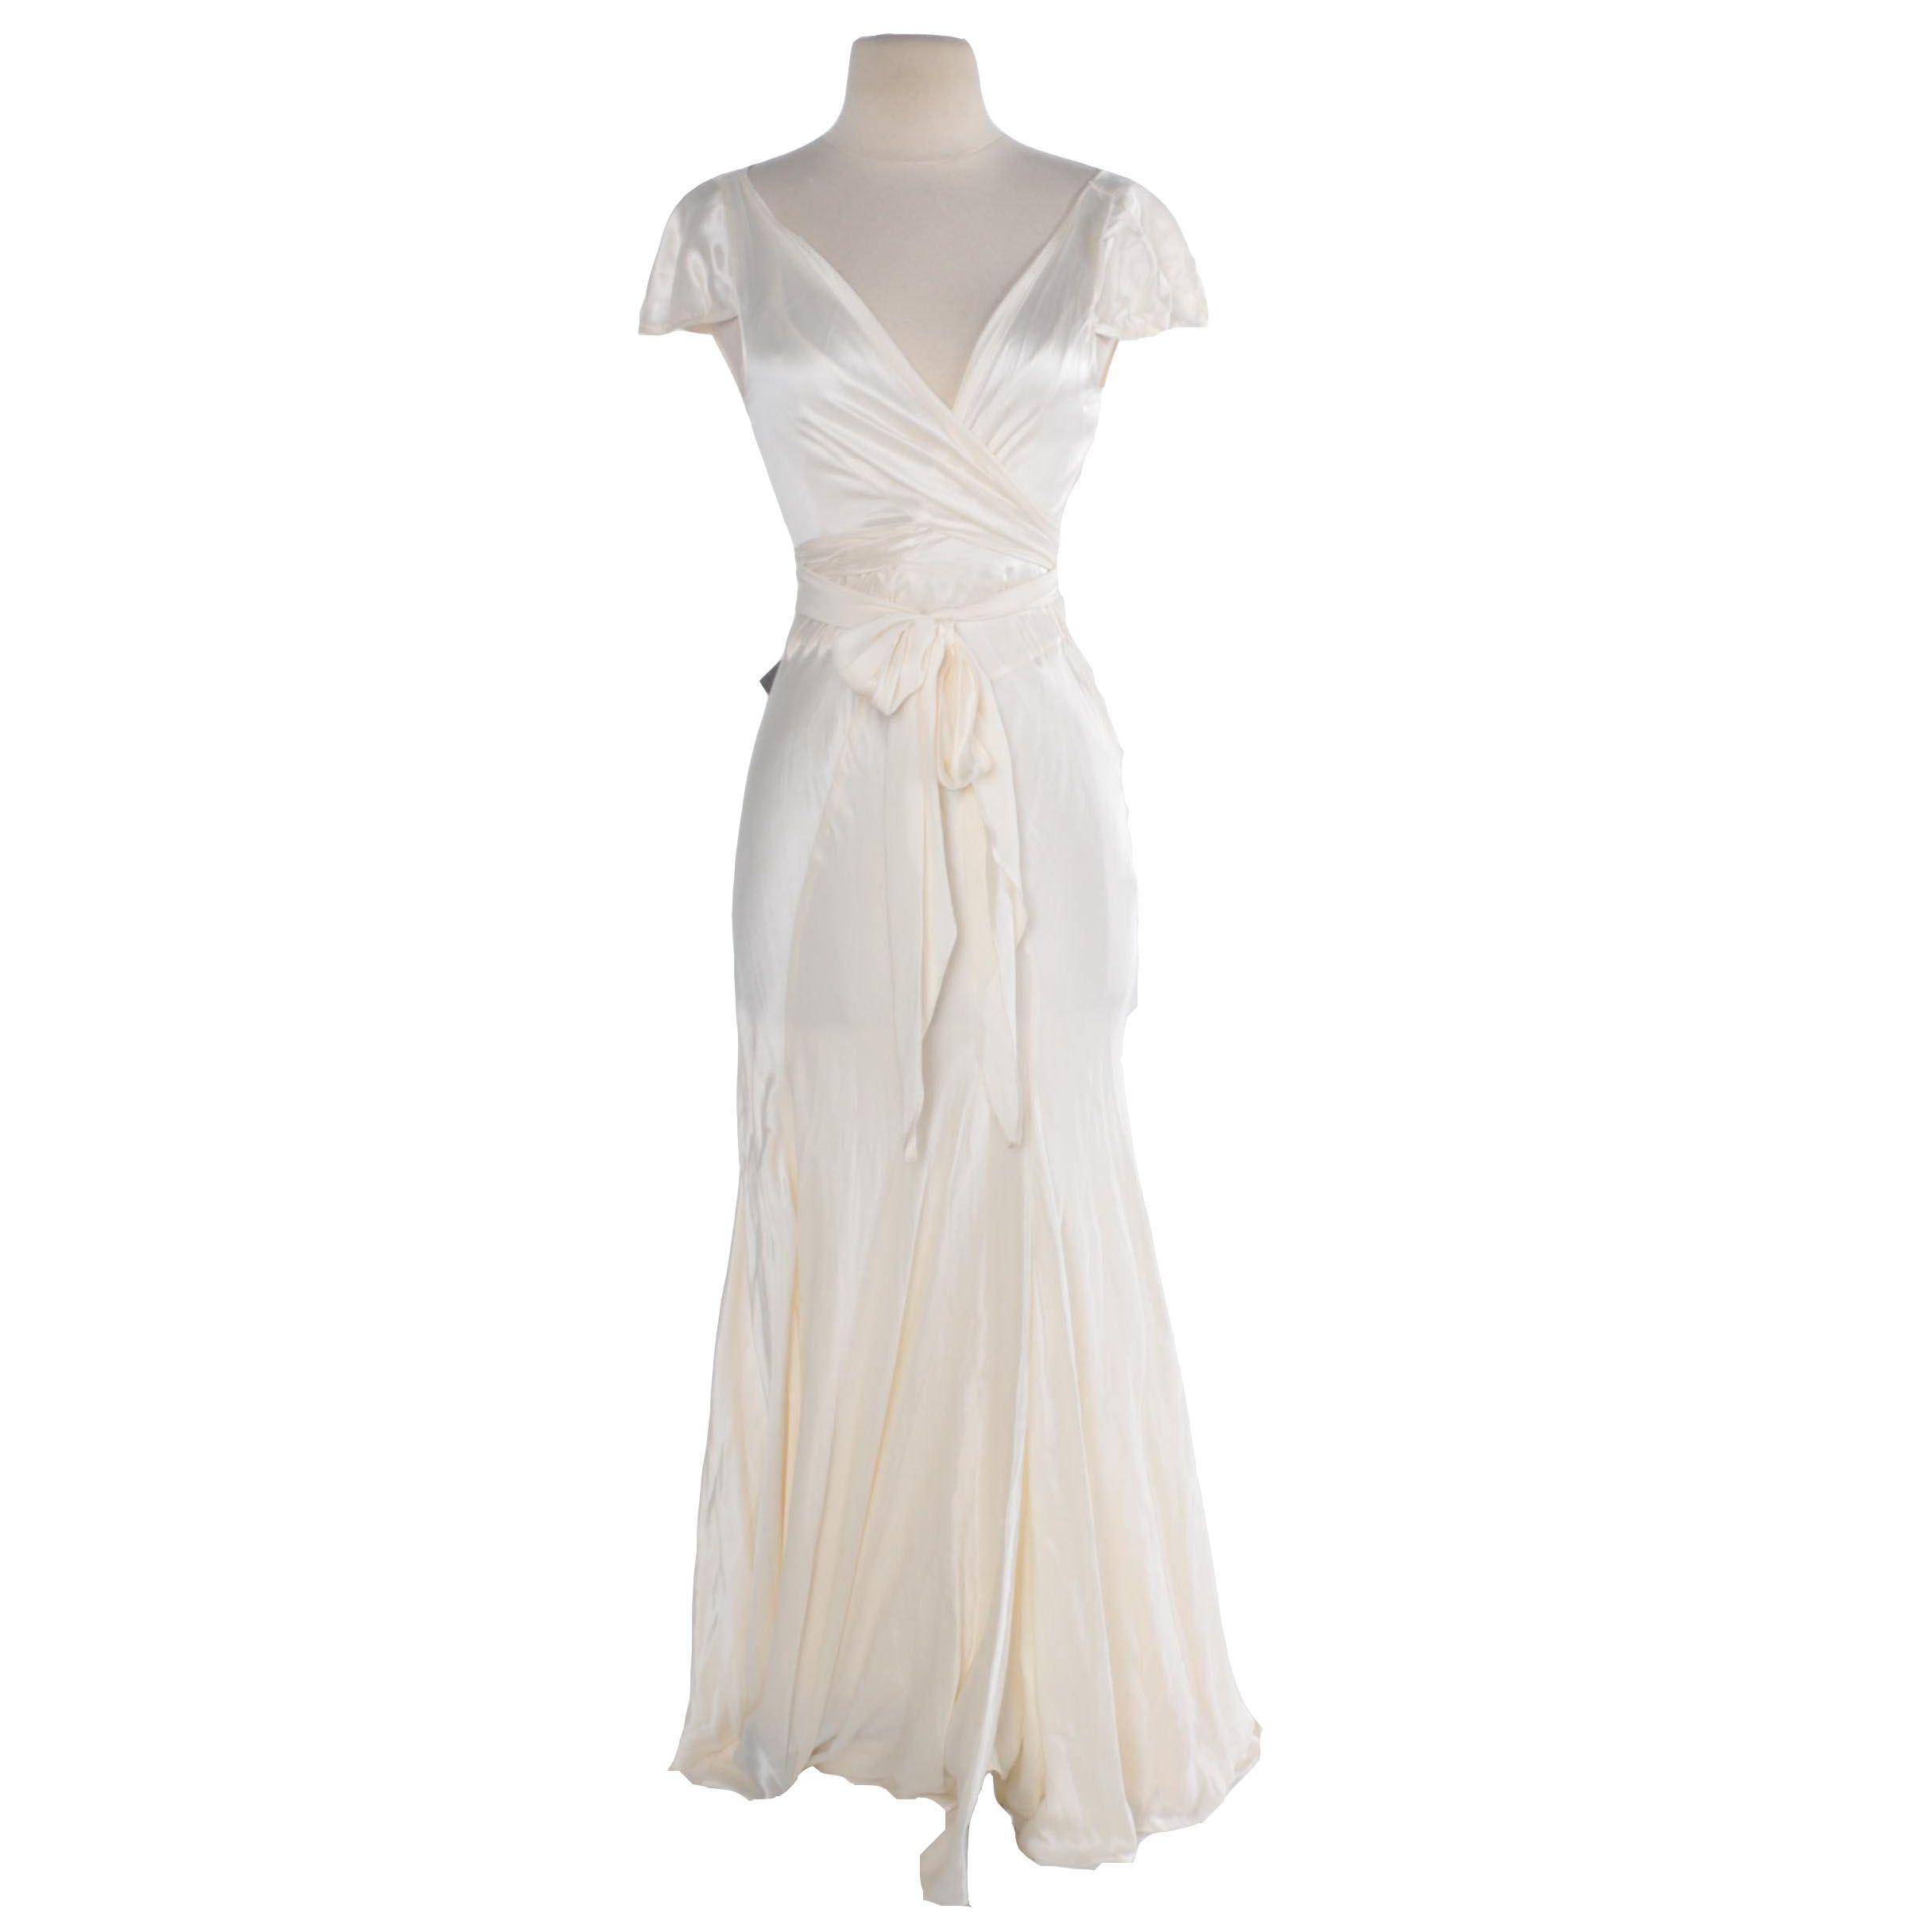 Ainos Ivory Silk Dress with Slip